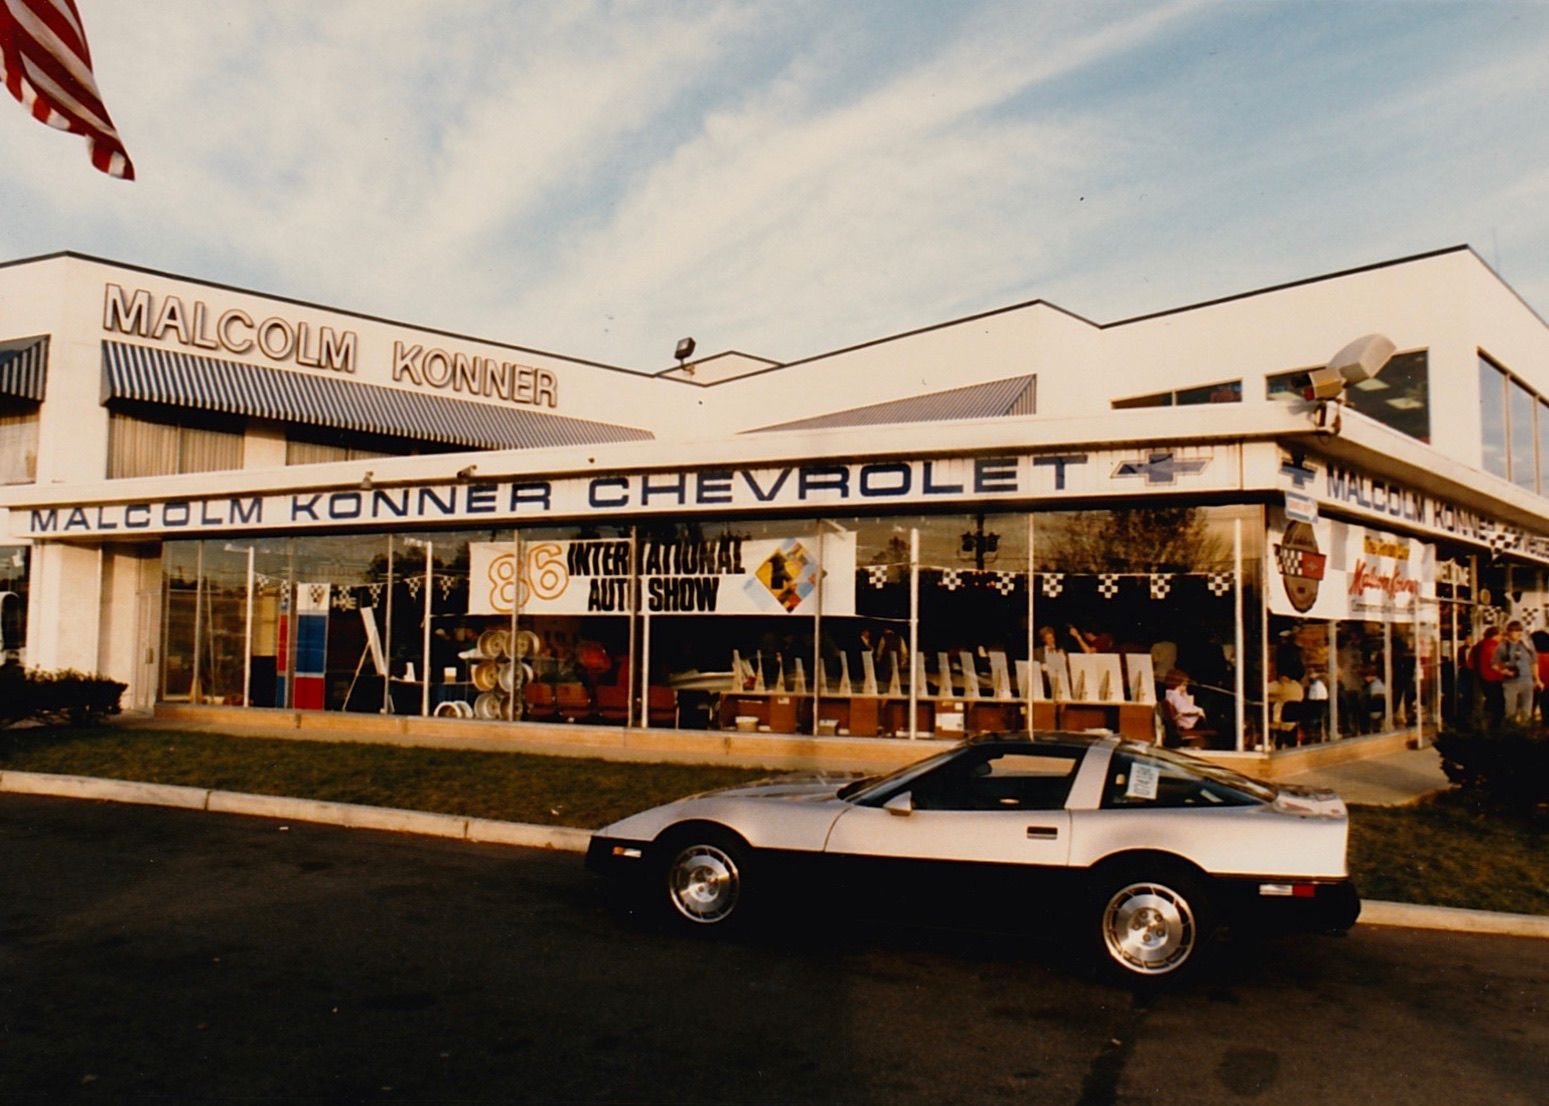 Malcolm Konner Commemorative Edition 1986 Corvette Chevrolet Malcolm